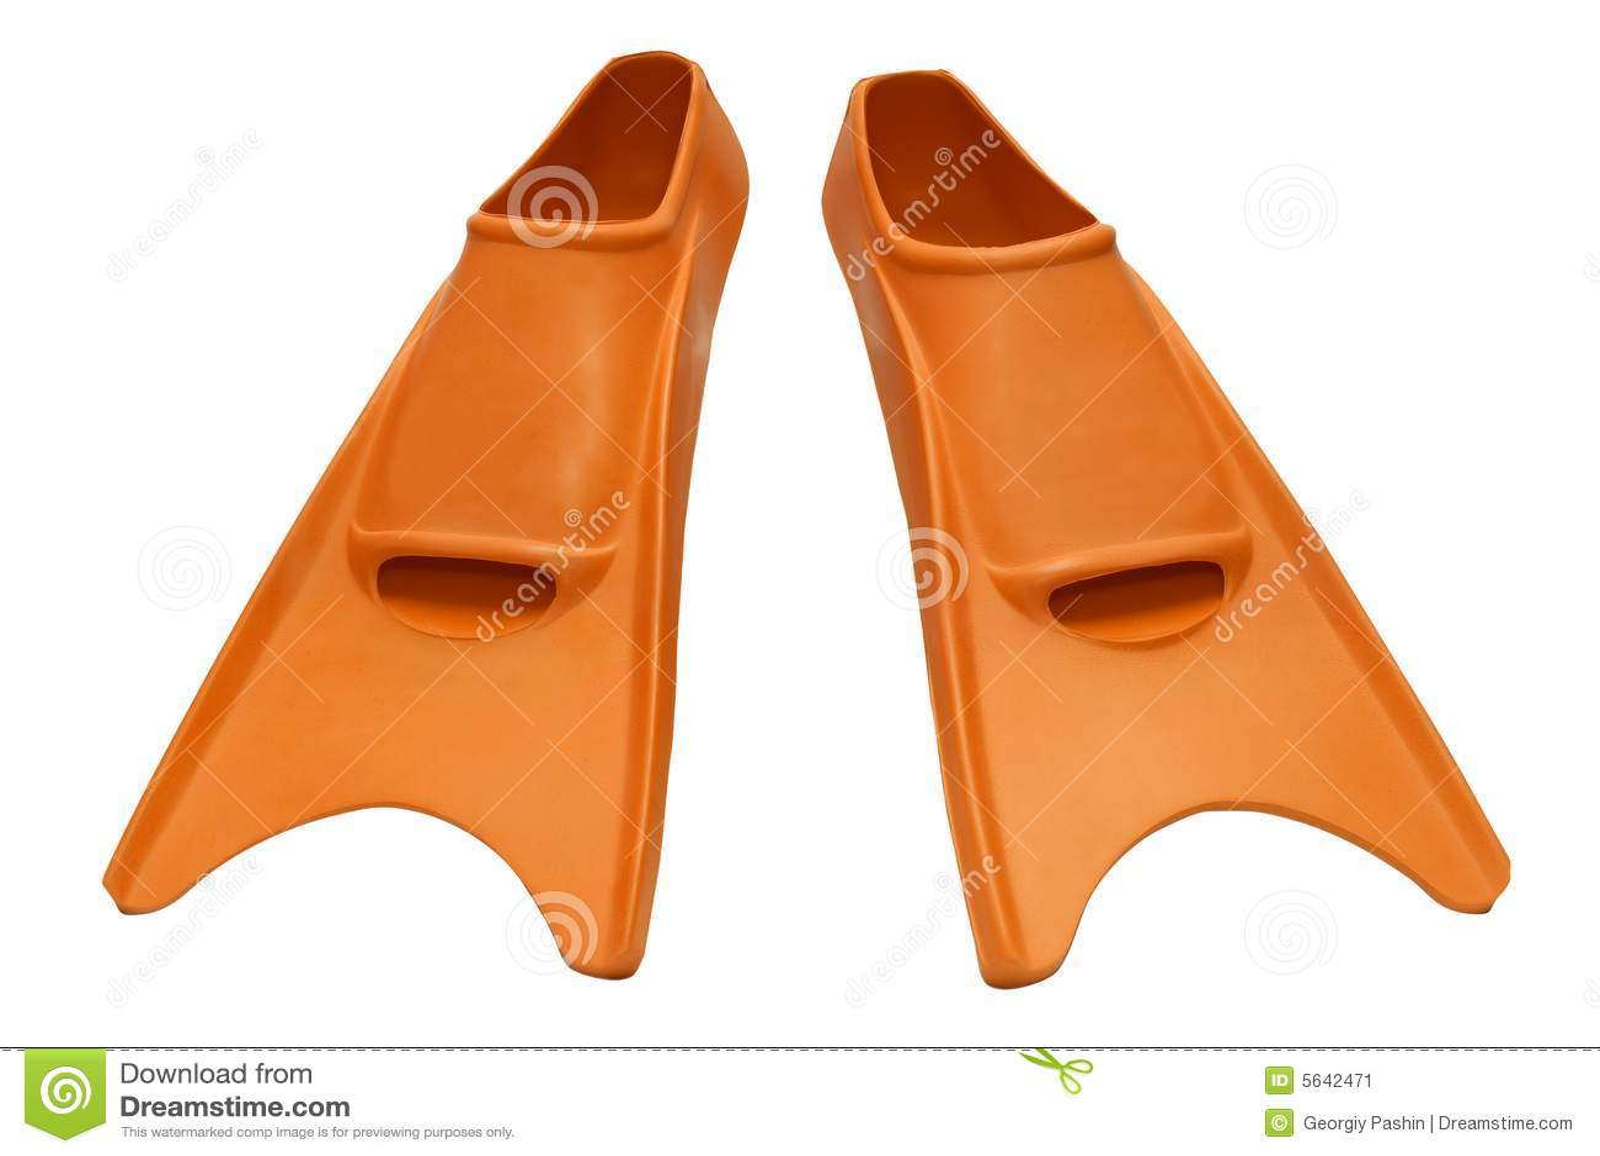 Orange flippers isolated